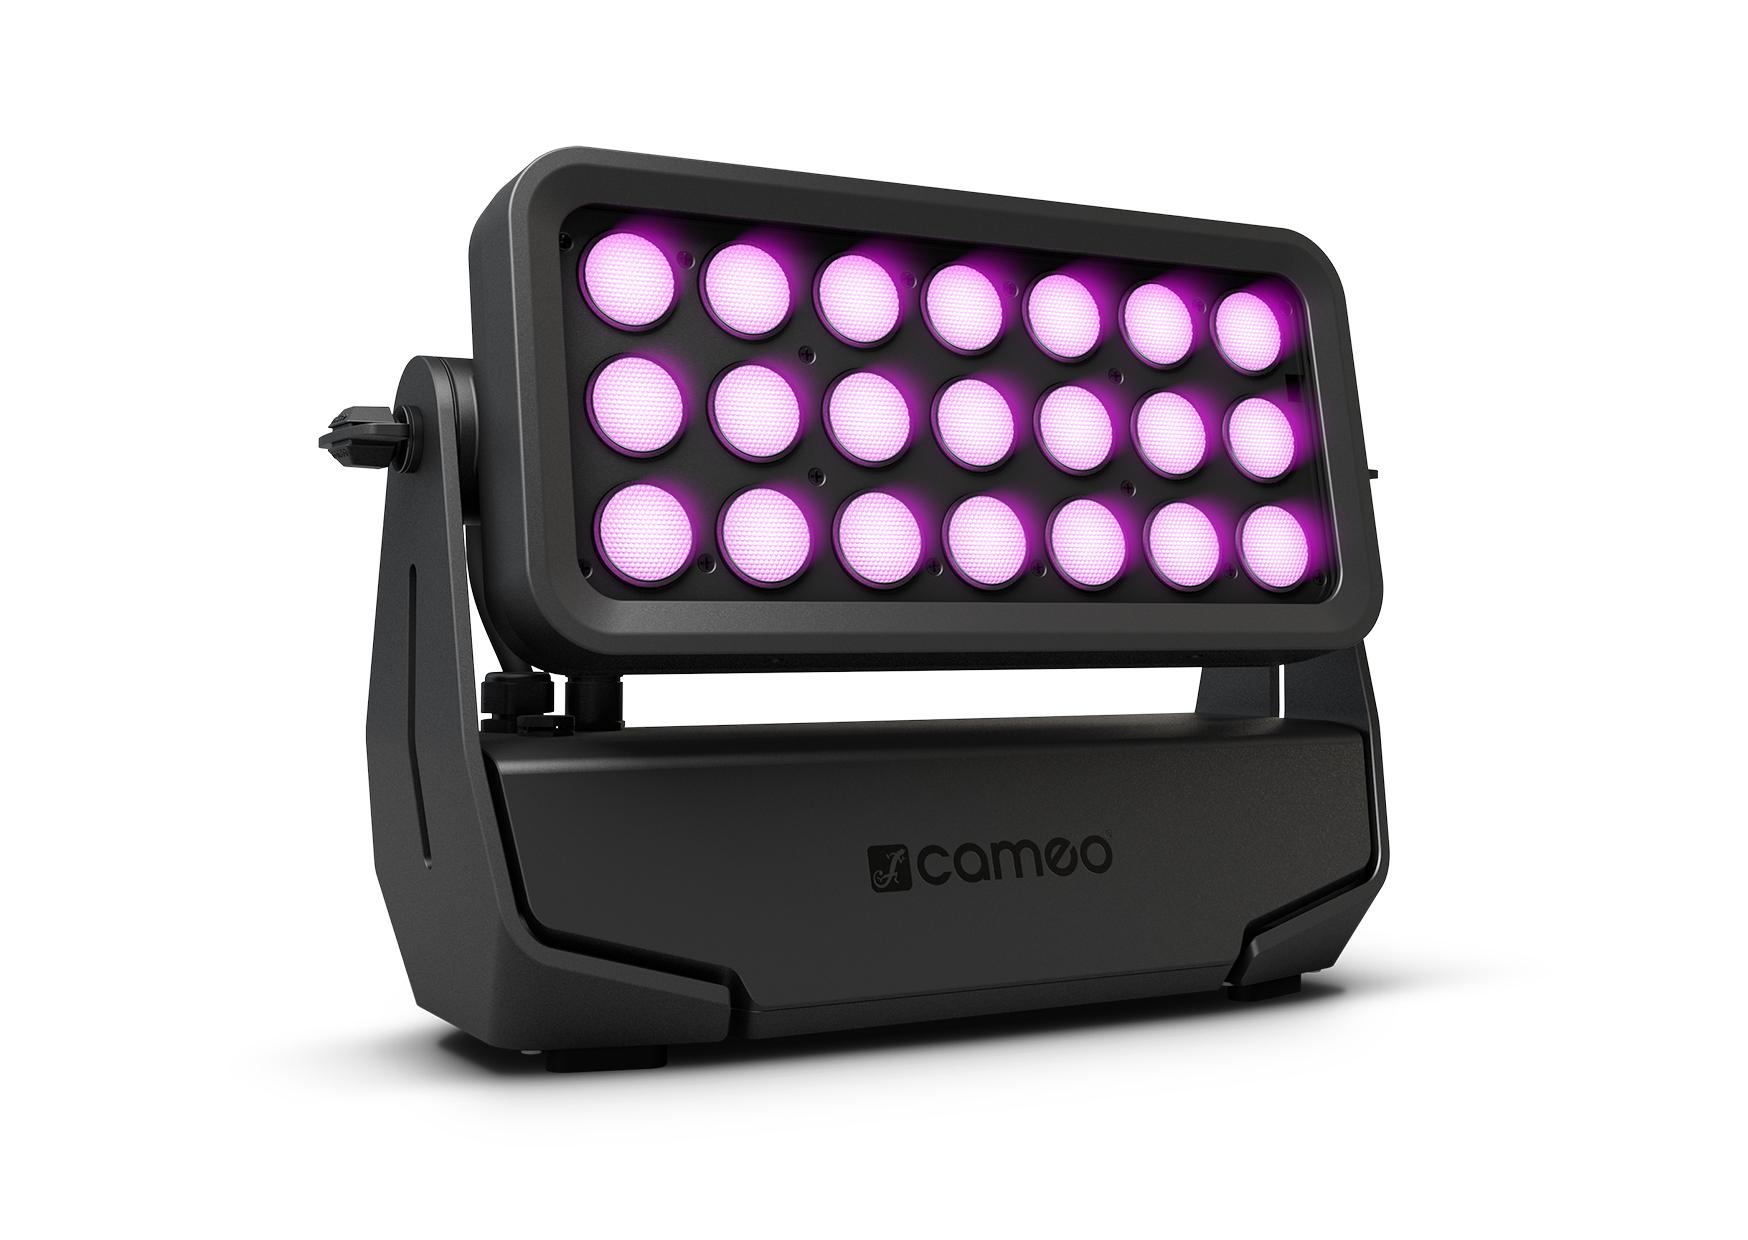 Cameo-ZENIT-W300